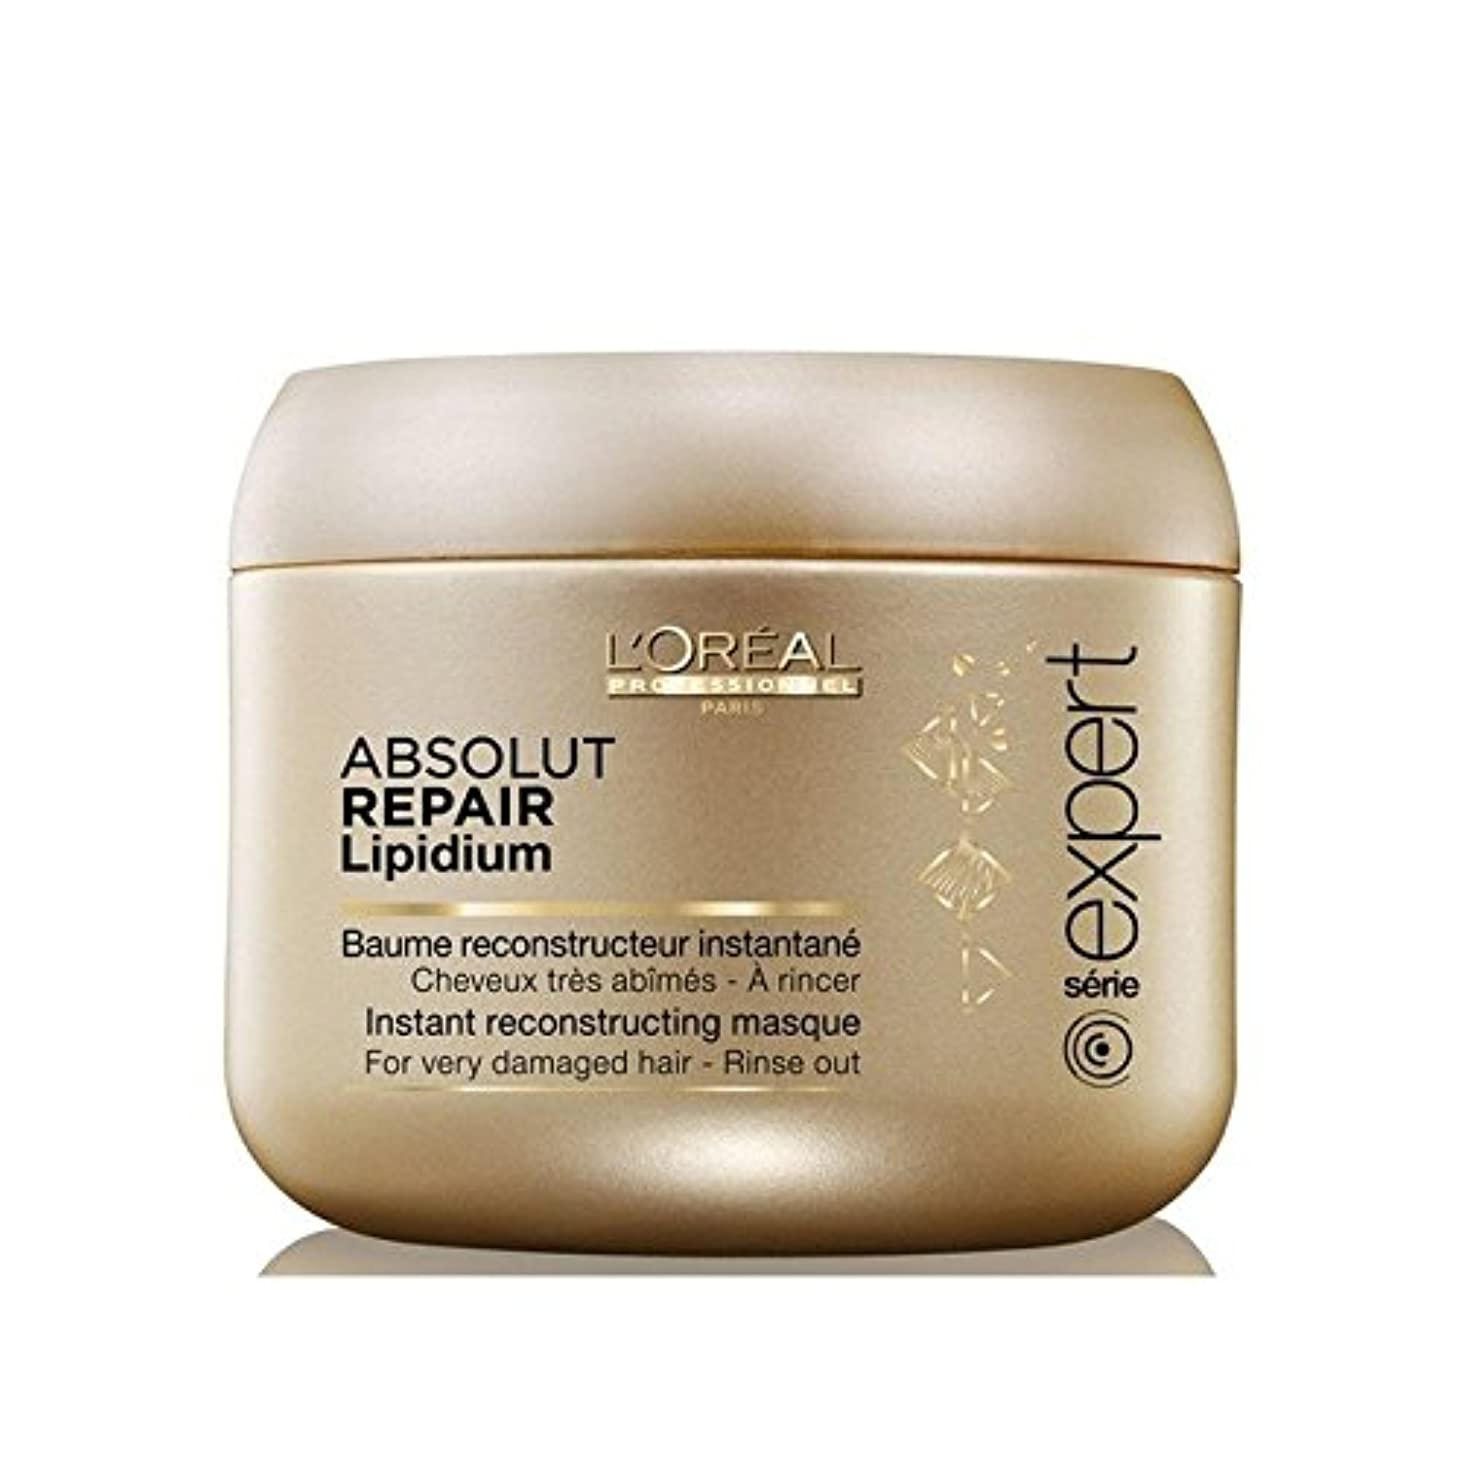 L'Oreal Professionnel Absolut Repair Lipidium Masque (200ml) - ロレアルプロフェッショナルのアブソルートリペアの仮面(200ミリリットル) [並行輸入品]